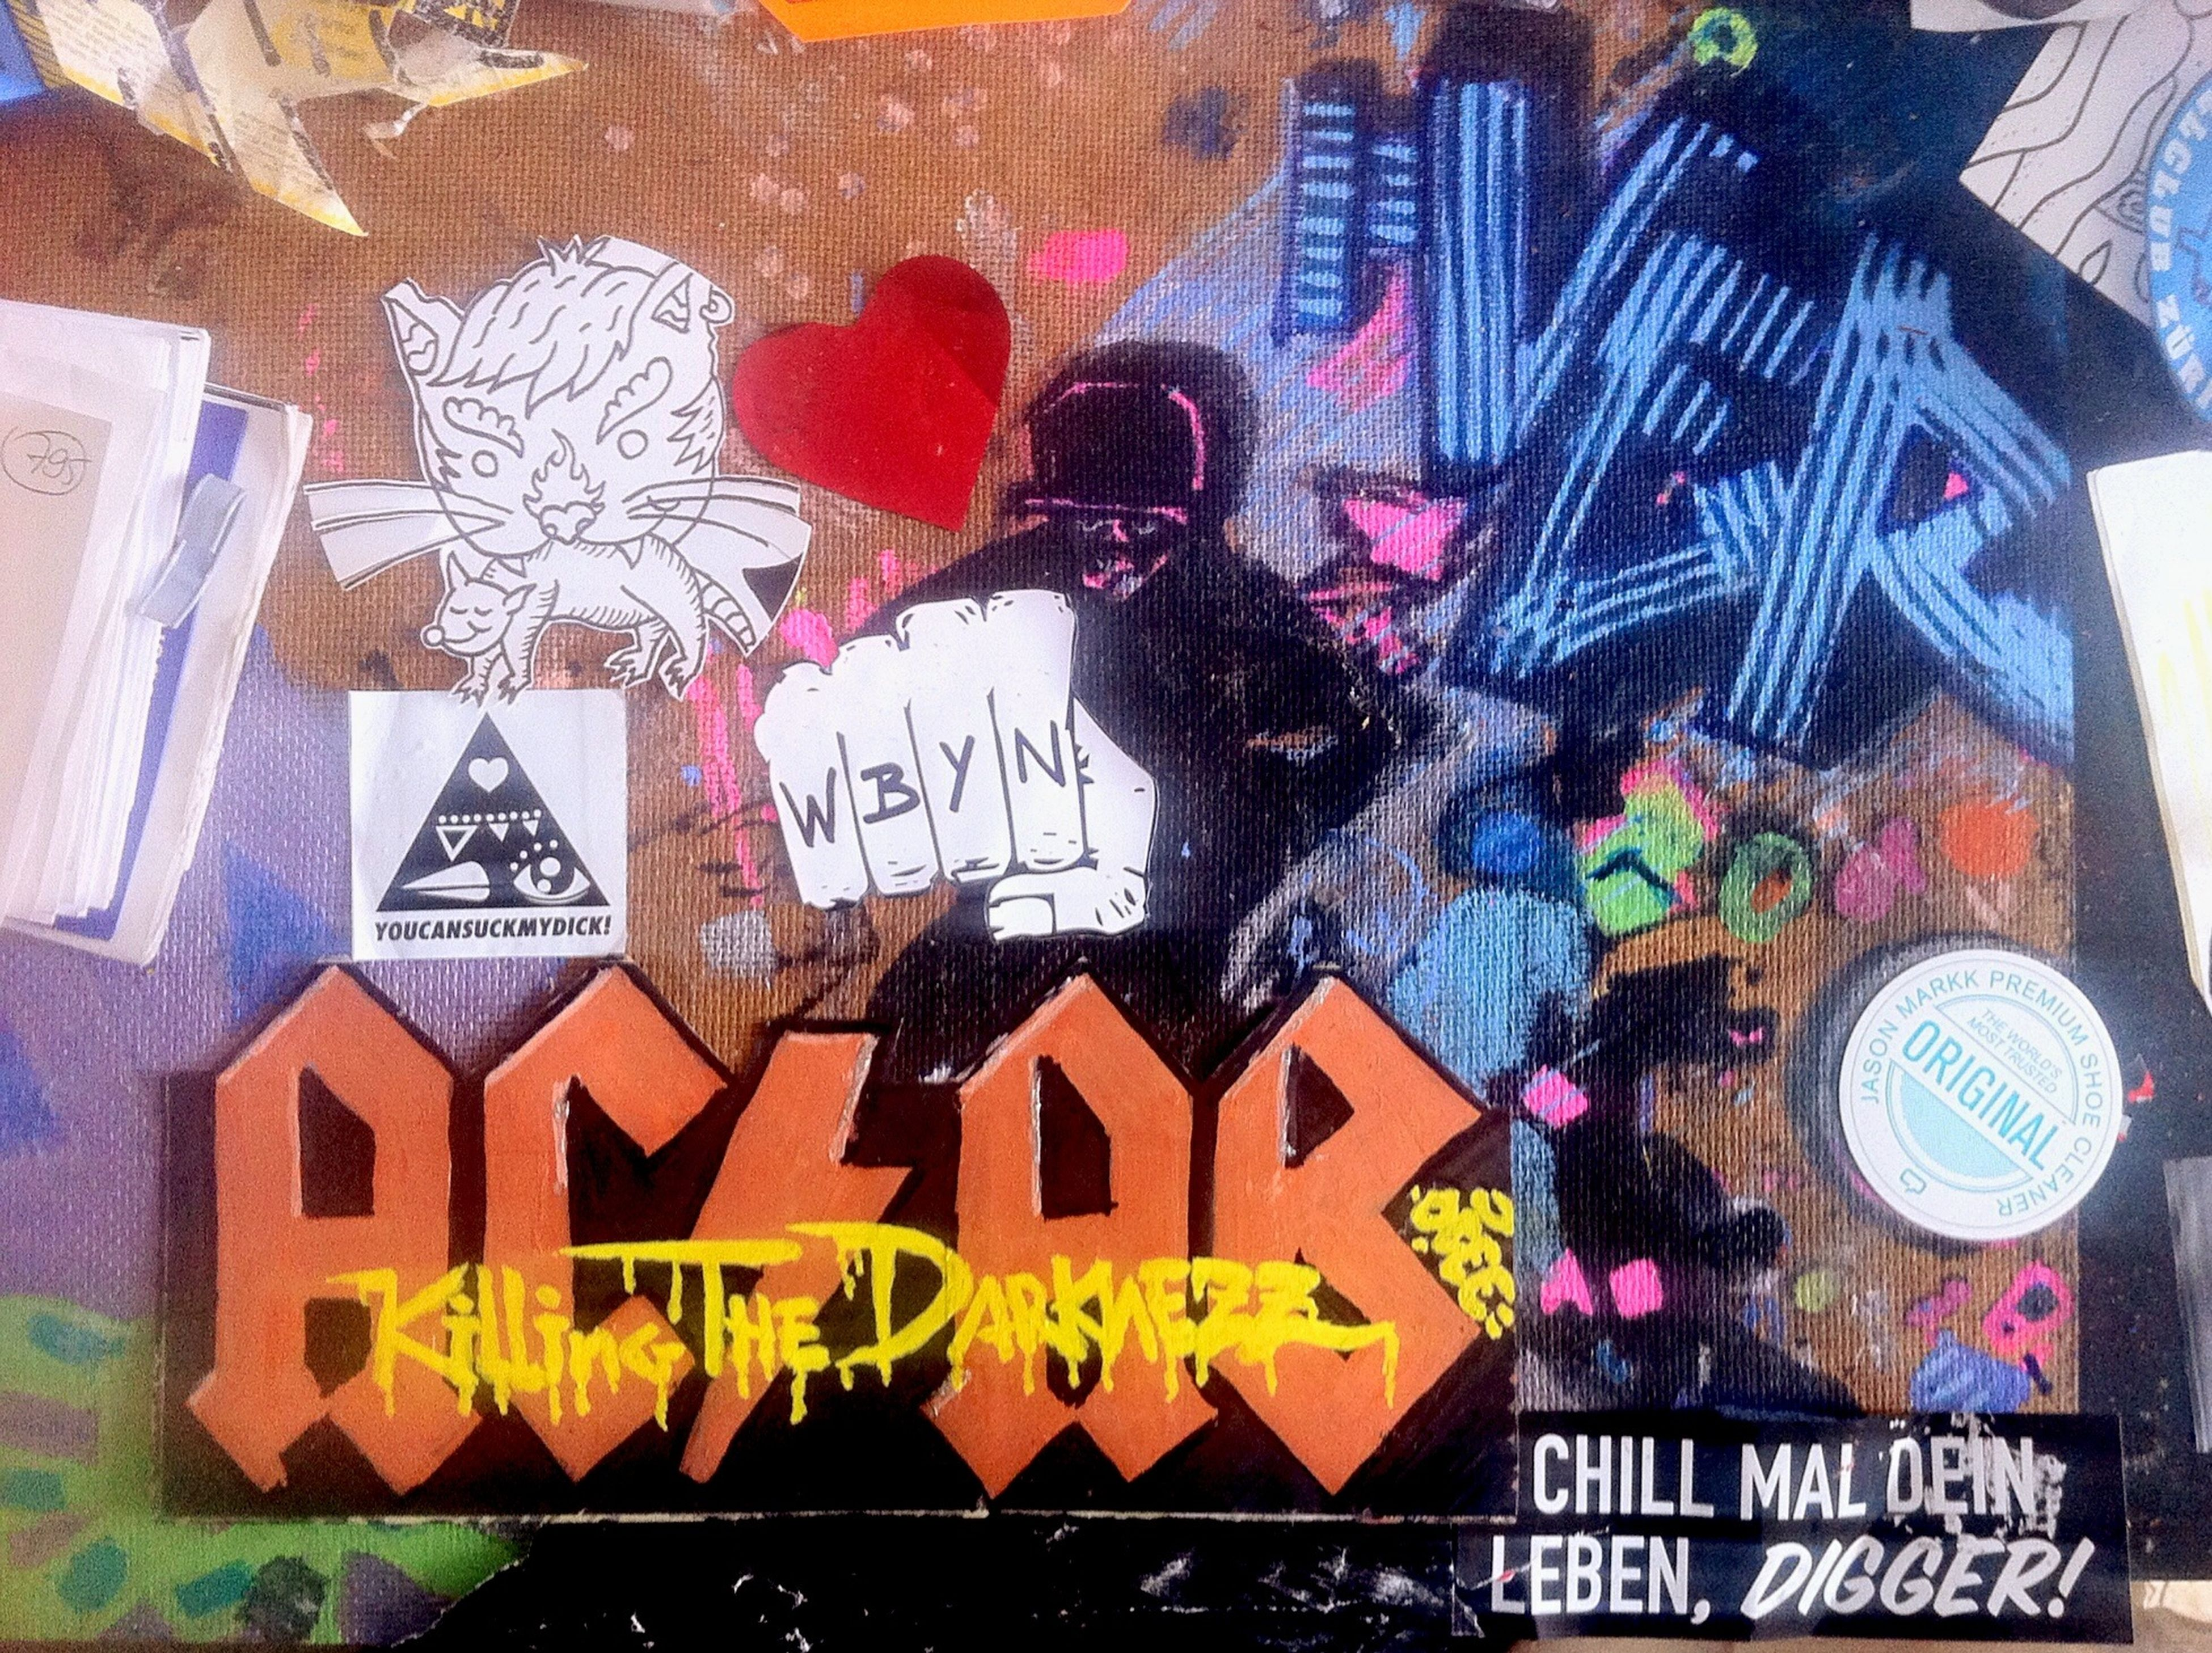 Create some Handmade Stickerart / Sticker Art !! Graffiti > ACAB // Killing The Darknezz < | > Ver < | Creativity || Look on my Desk